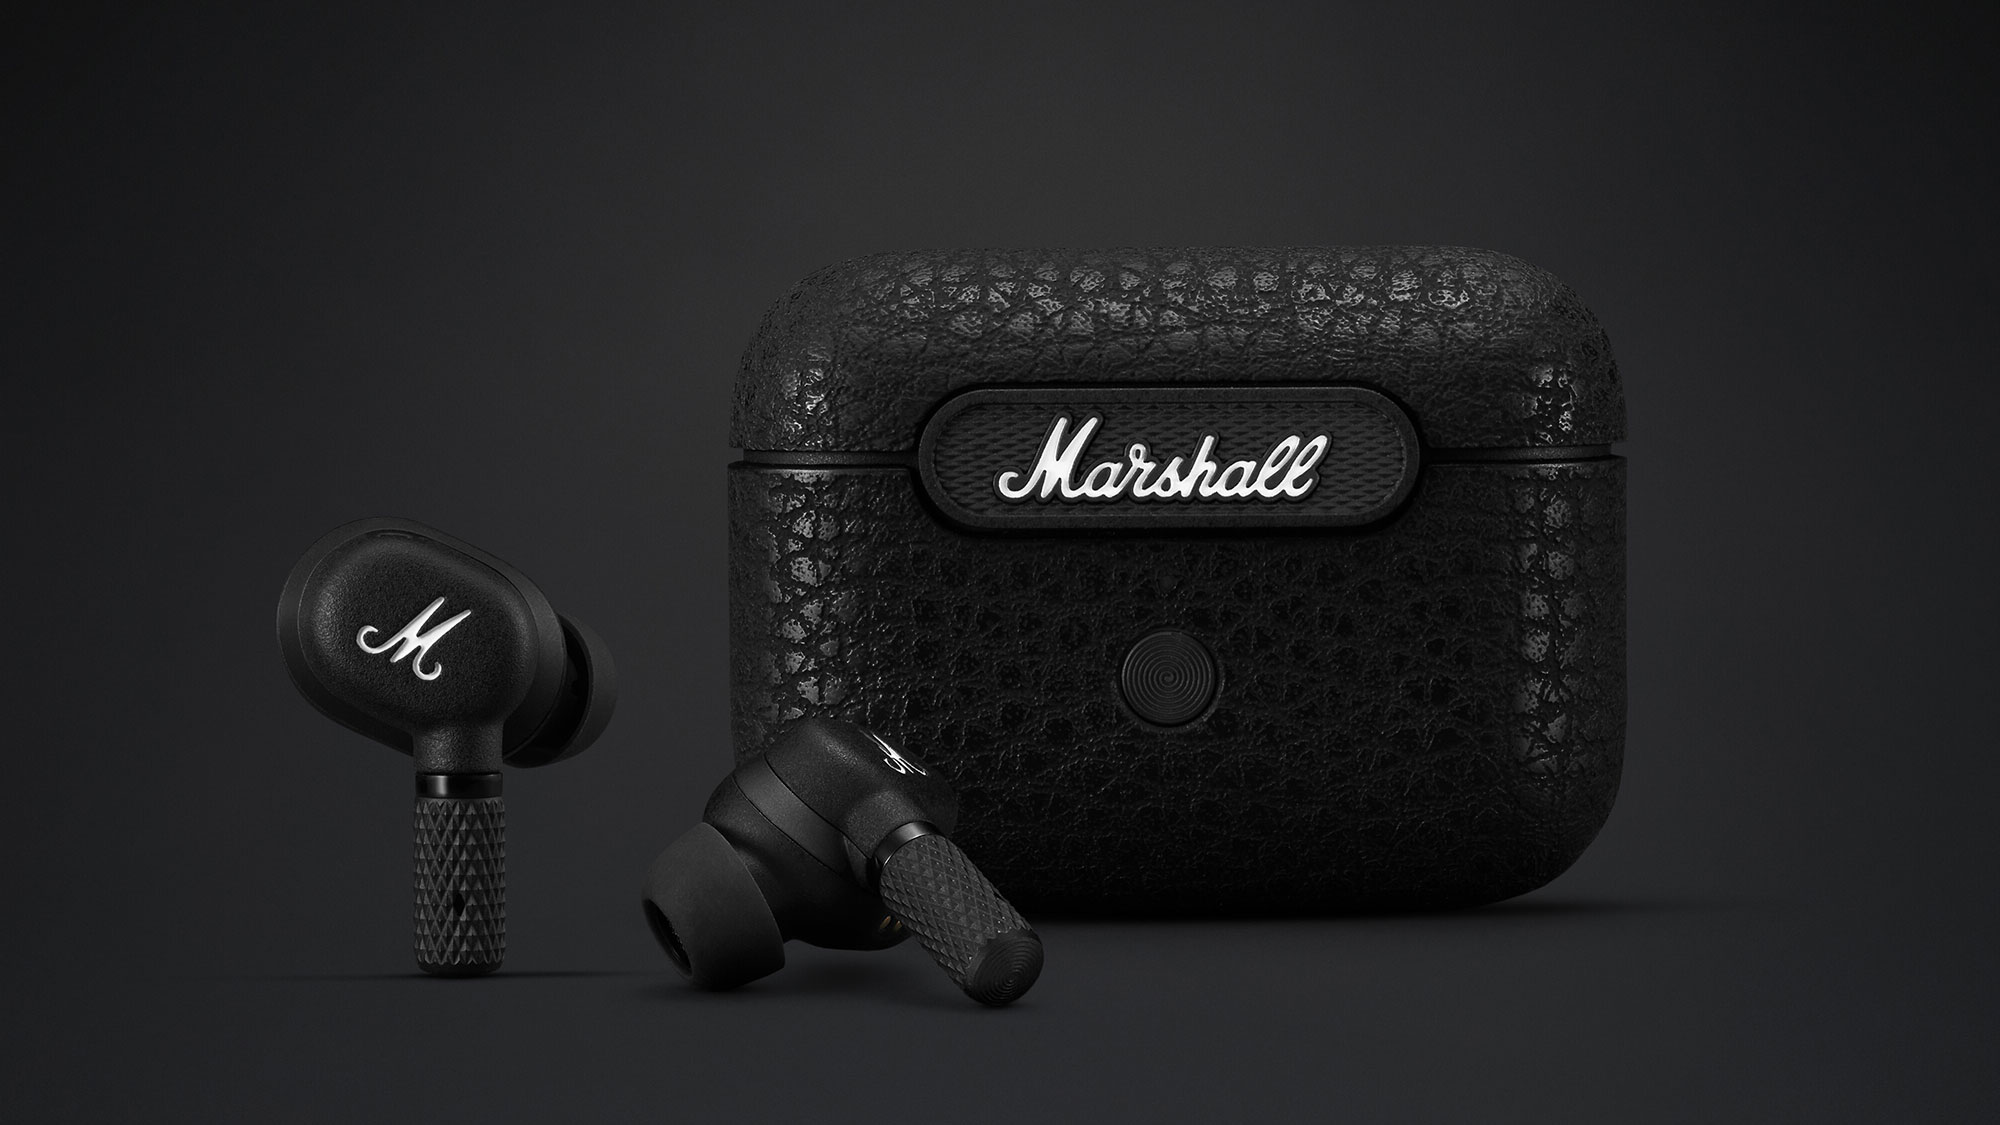 Marshall Motif ANC True Wireless Earbuds